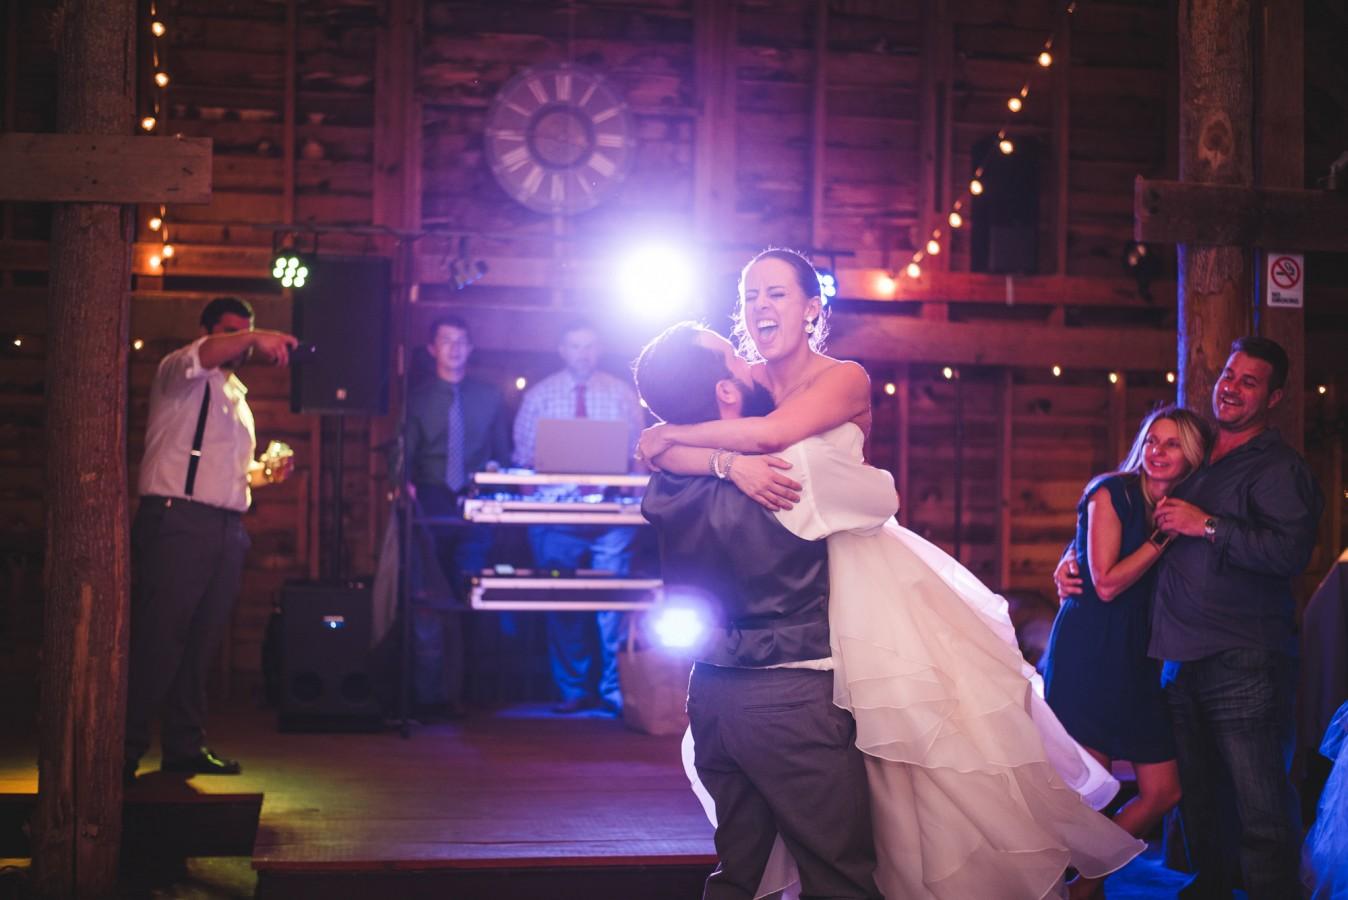 fete-photography-weddings-012